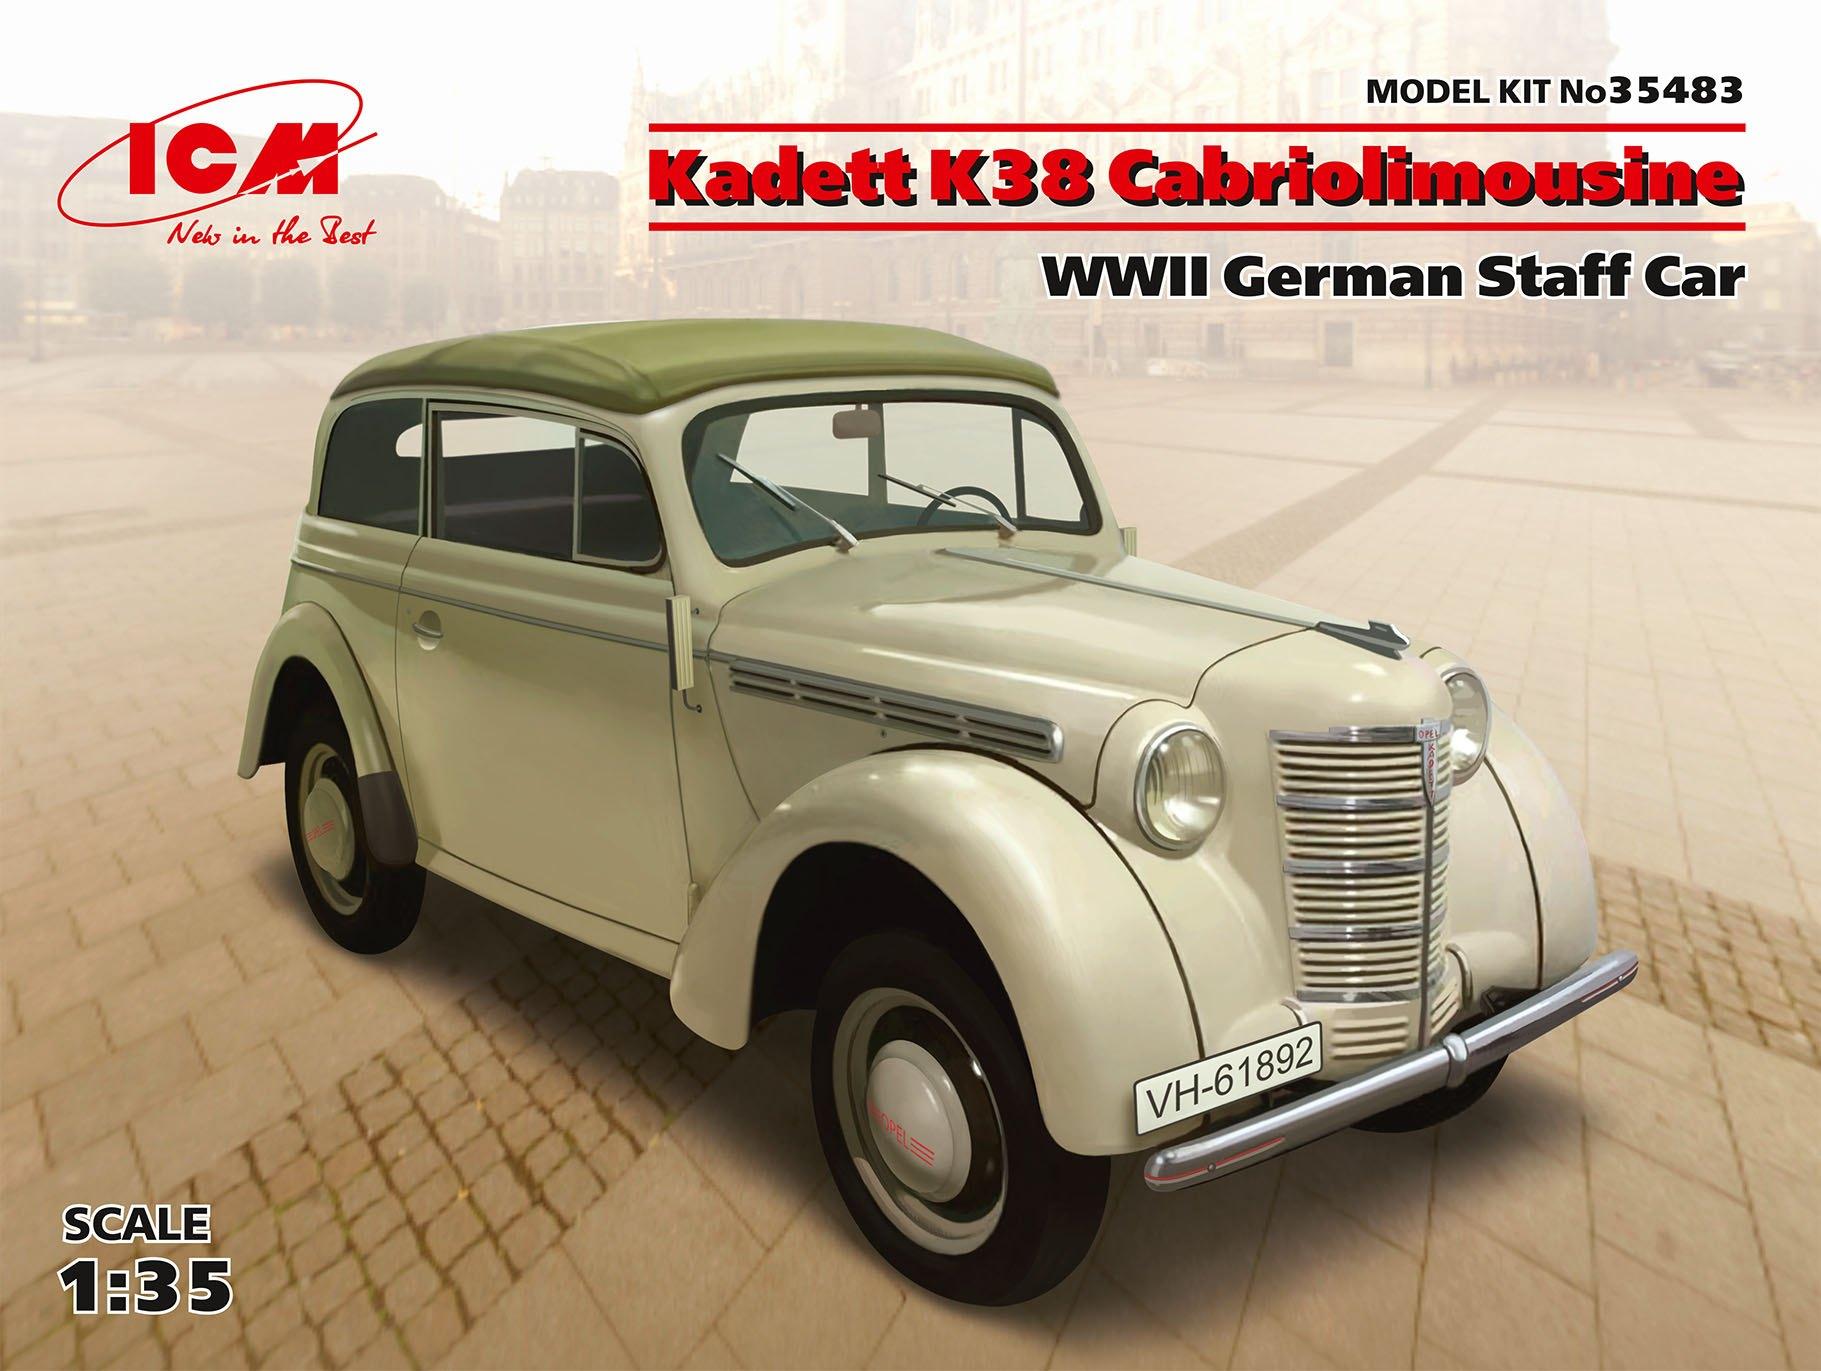 ICM Kadett K38 Cabriolimousine, WWII German Staff Car